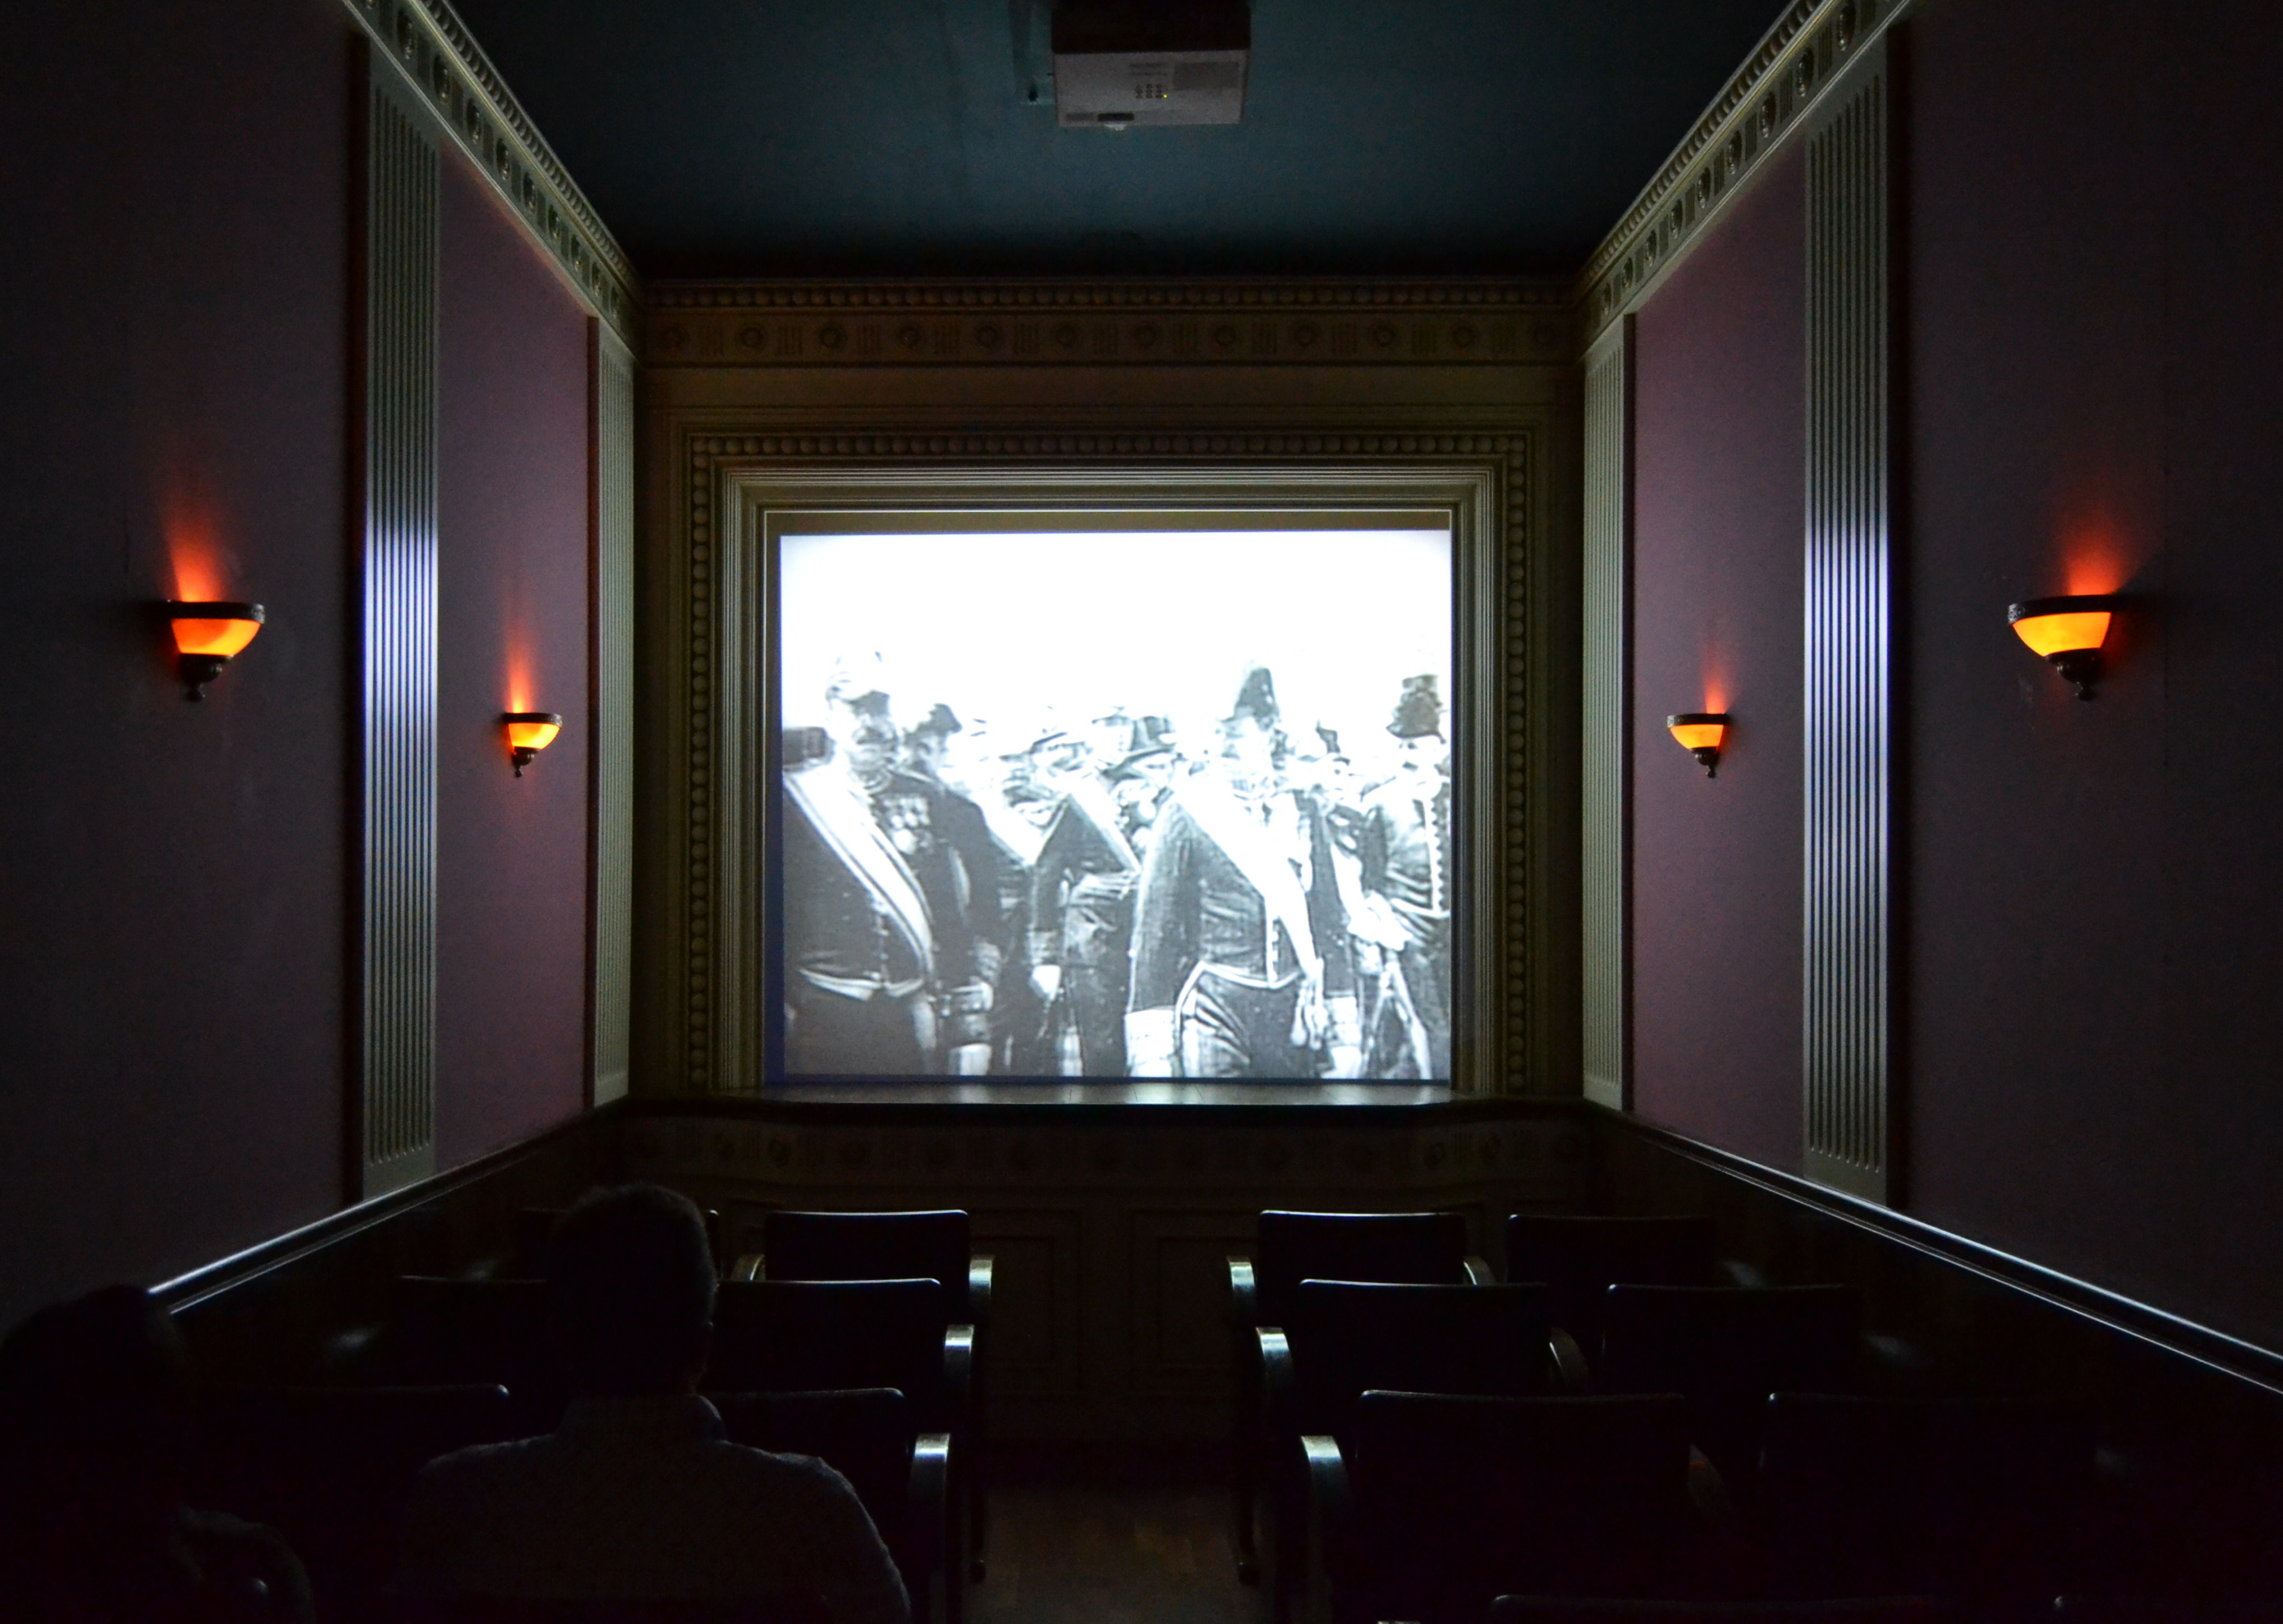 File Sala De Cinema Al Museu D Hist Ria De Val Ncia Jpg Wikimedia  -> Imagem De Sala De Cinema